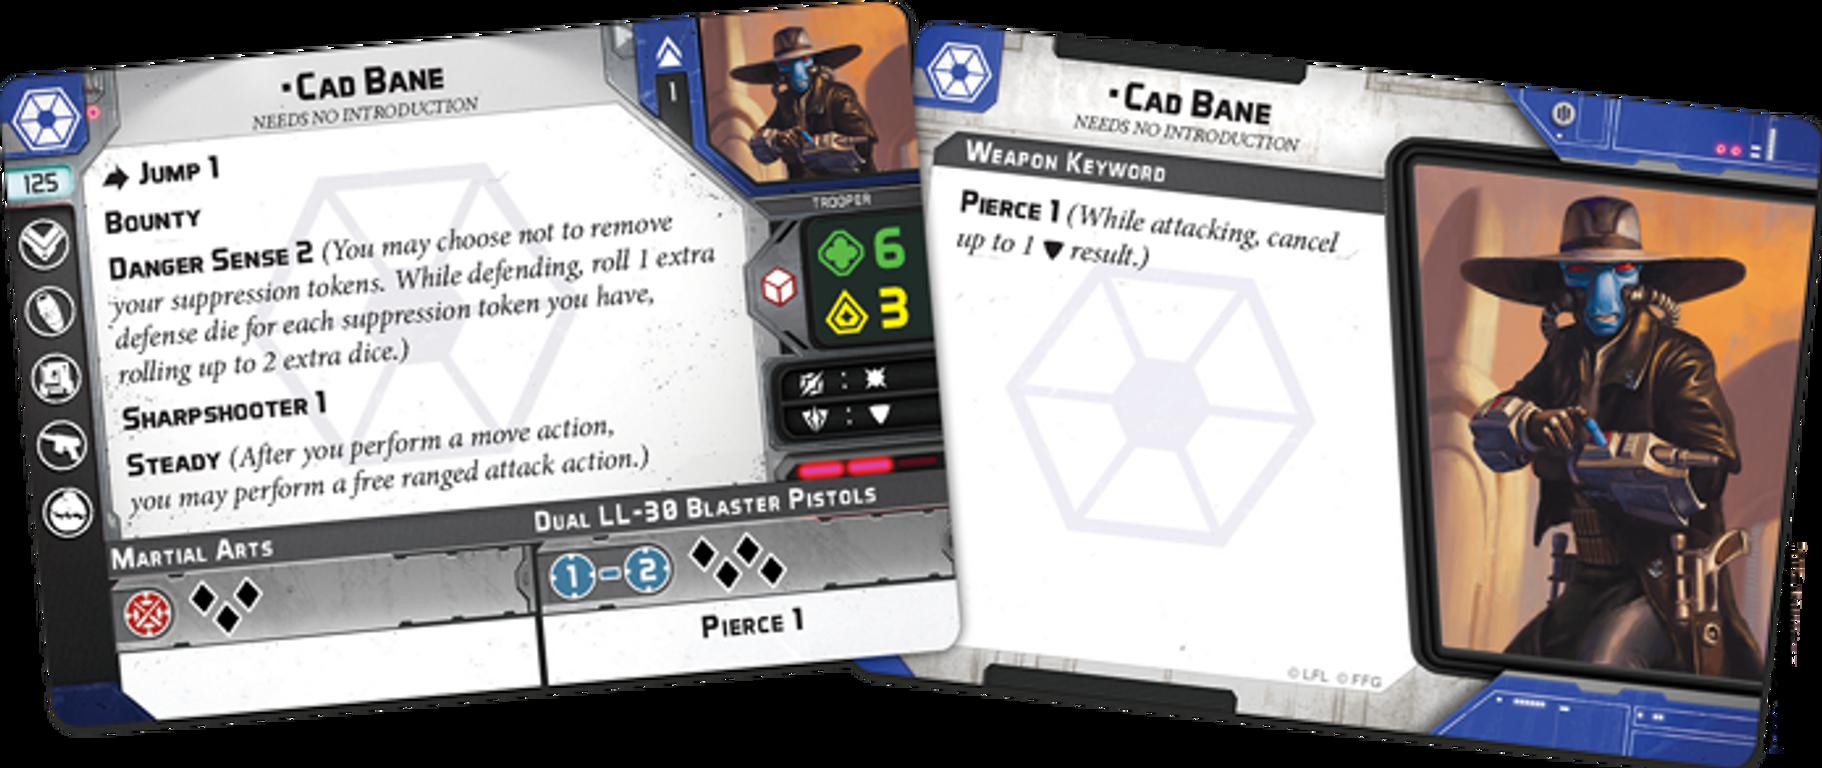 Star Wars: Legion - Cad Bane Operative Expansion cards